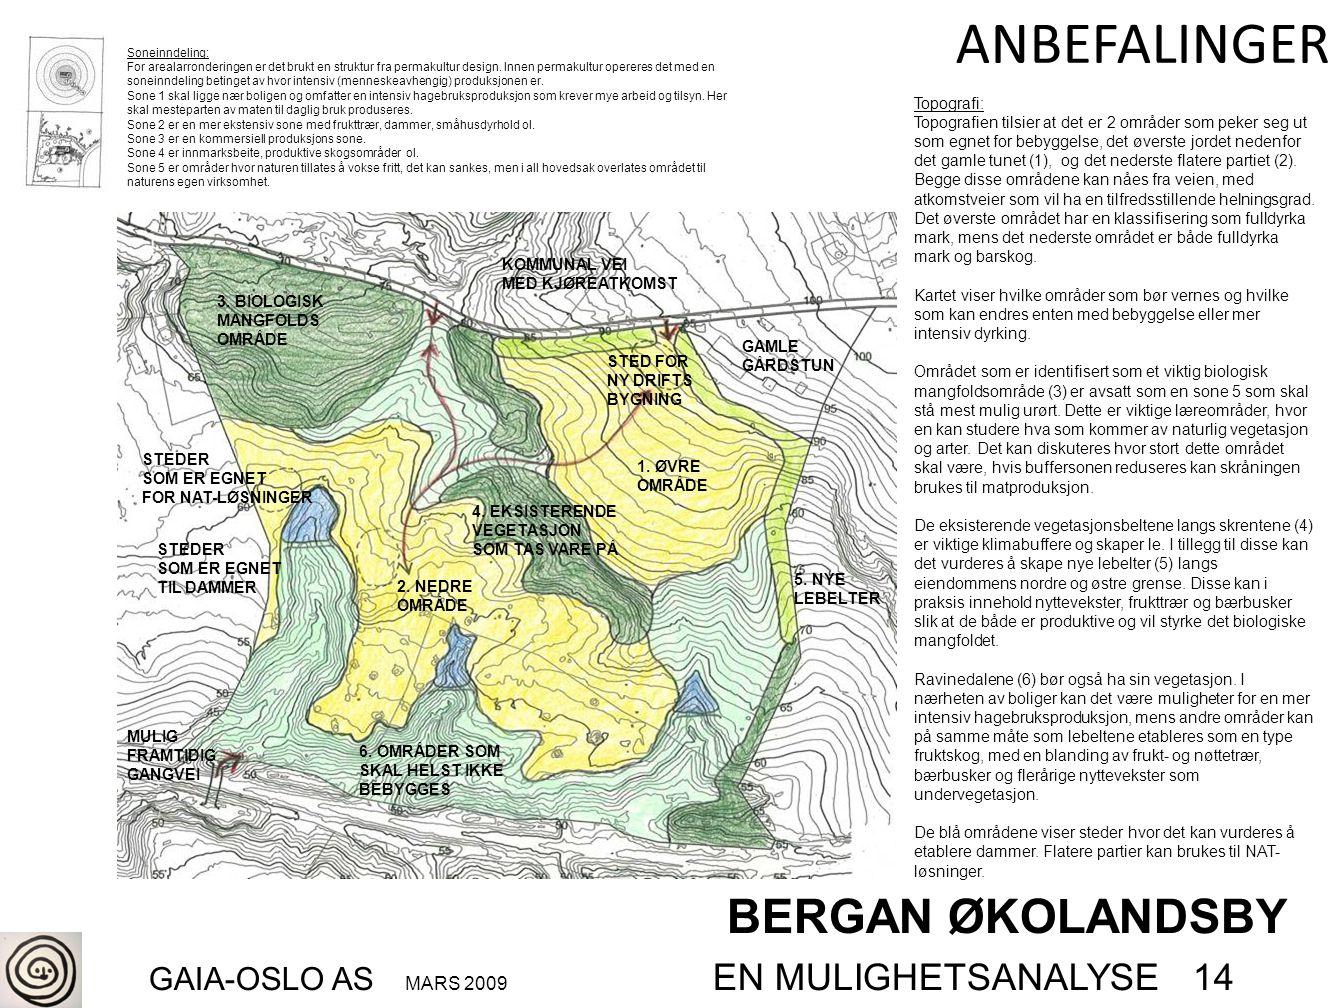 BERGAN ØKOLANDSBY GAIA-OSLO AS MARS 2009 EN MULIGHETSANALYSE 14